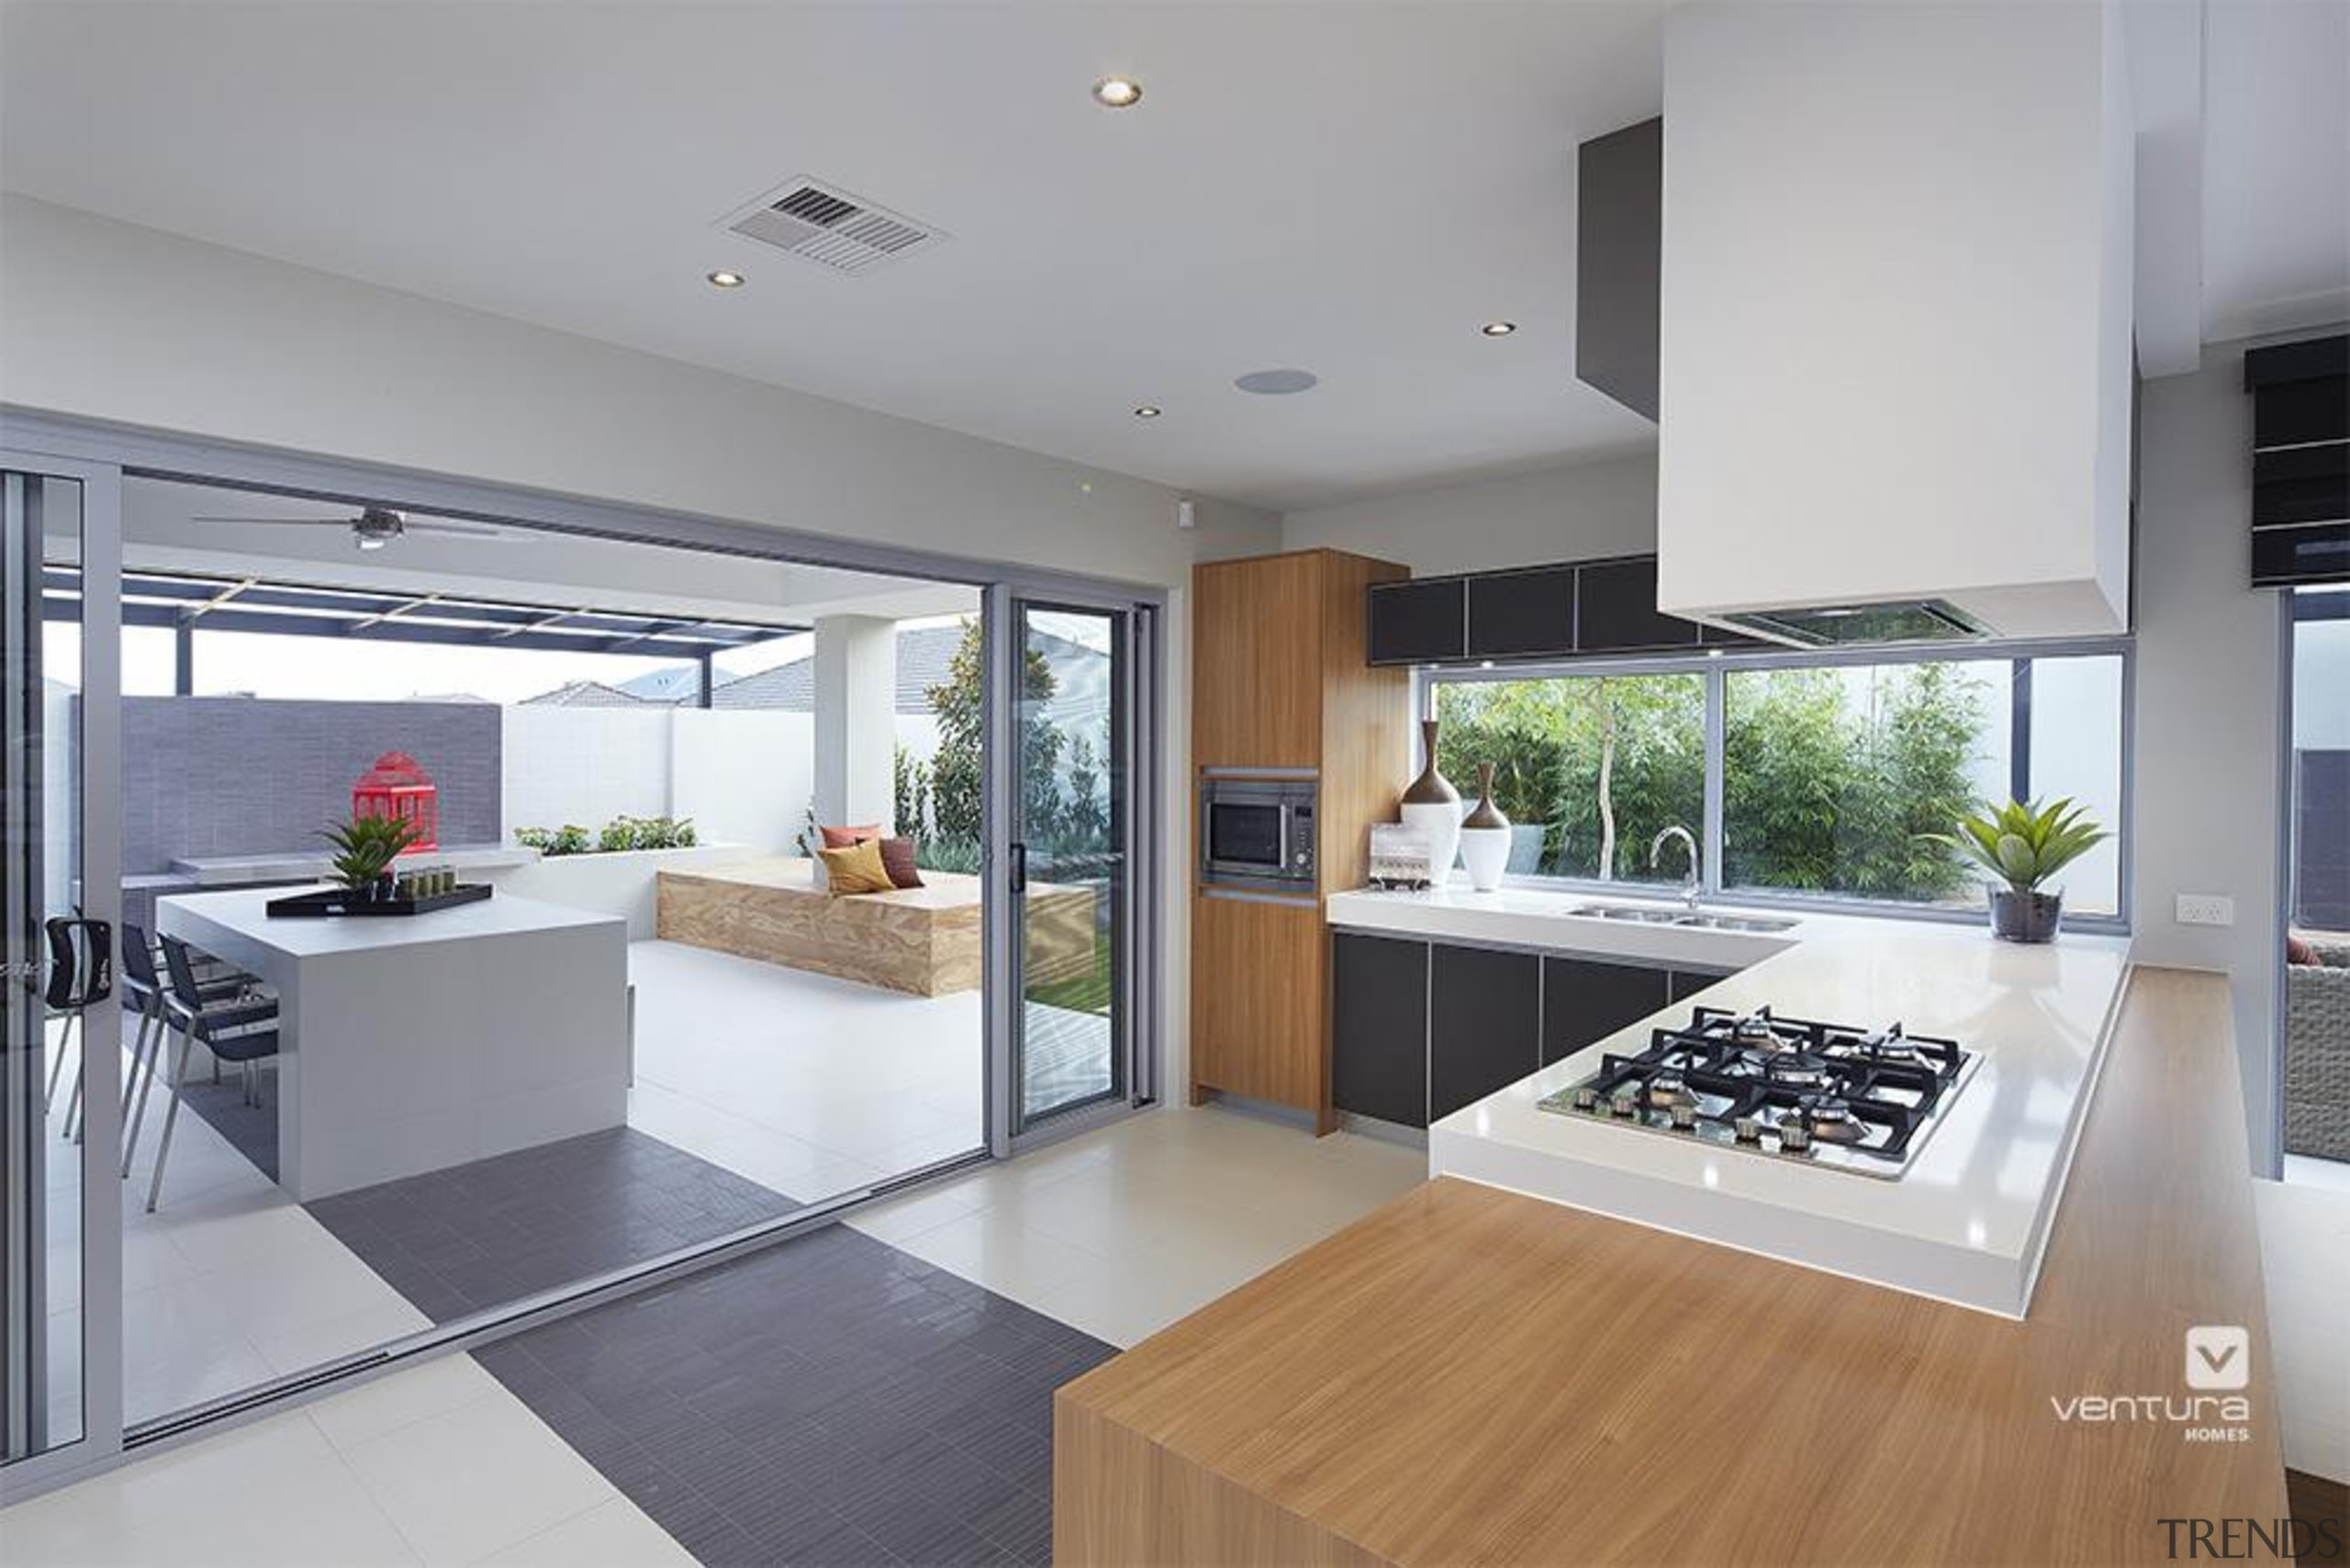 Kitchen design. - The Allure Display Home - countertop, house, interior design, kitchen, real estate, gray